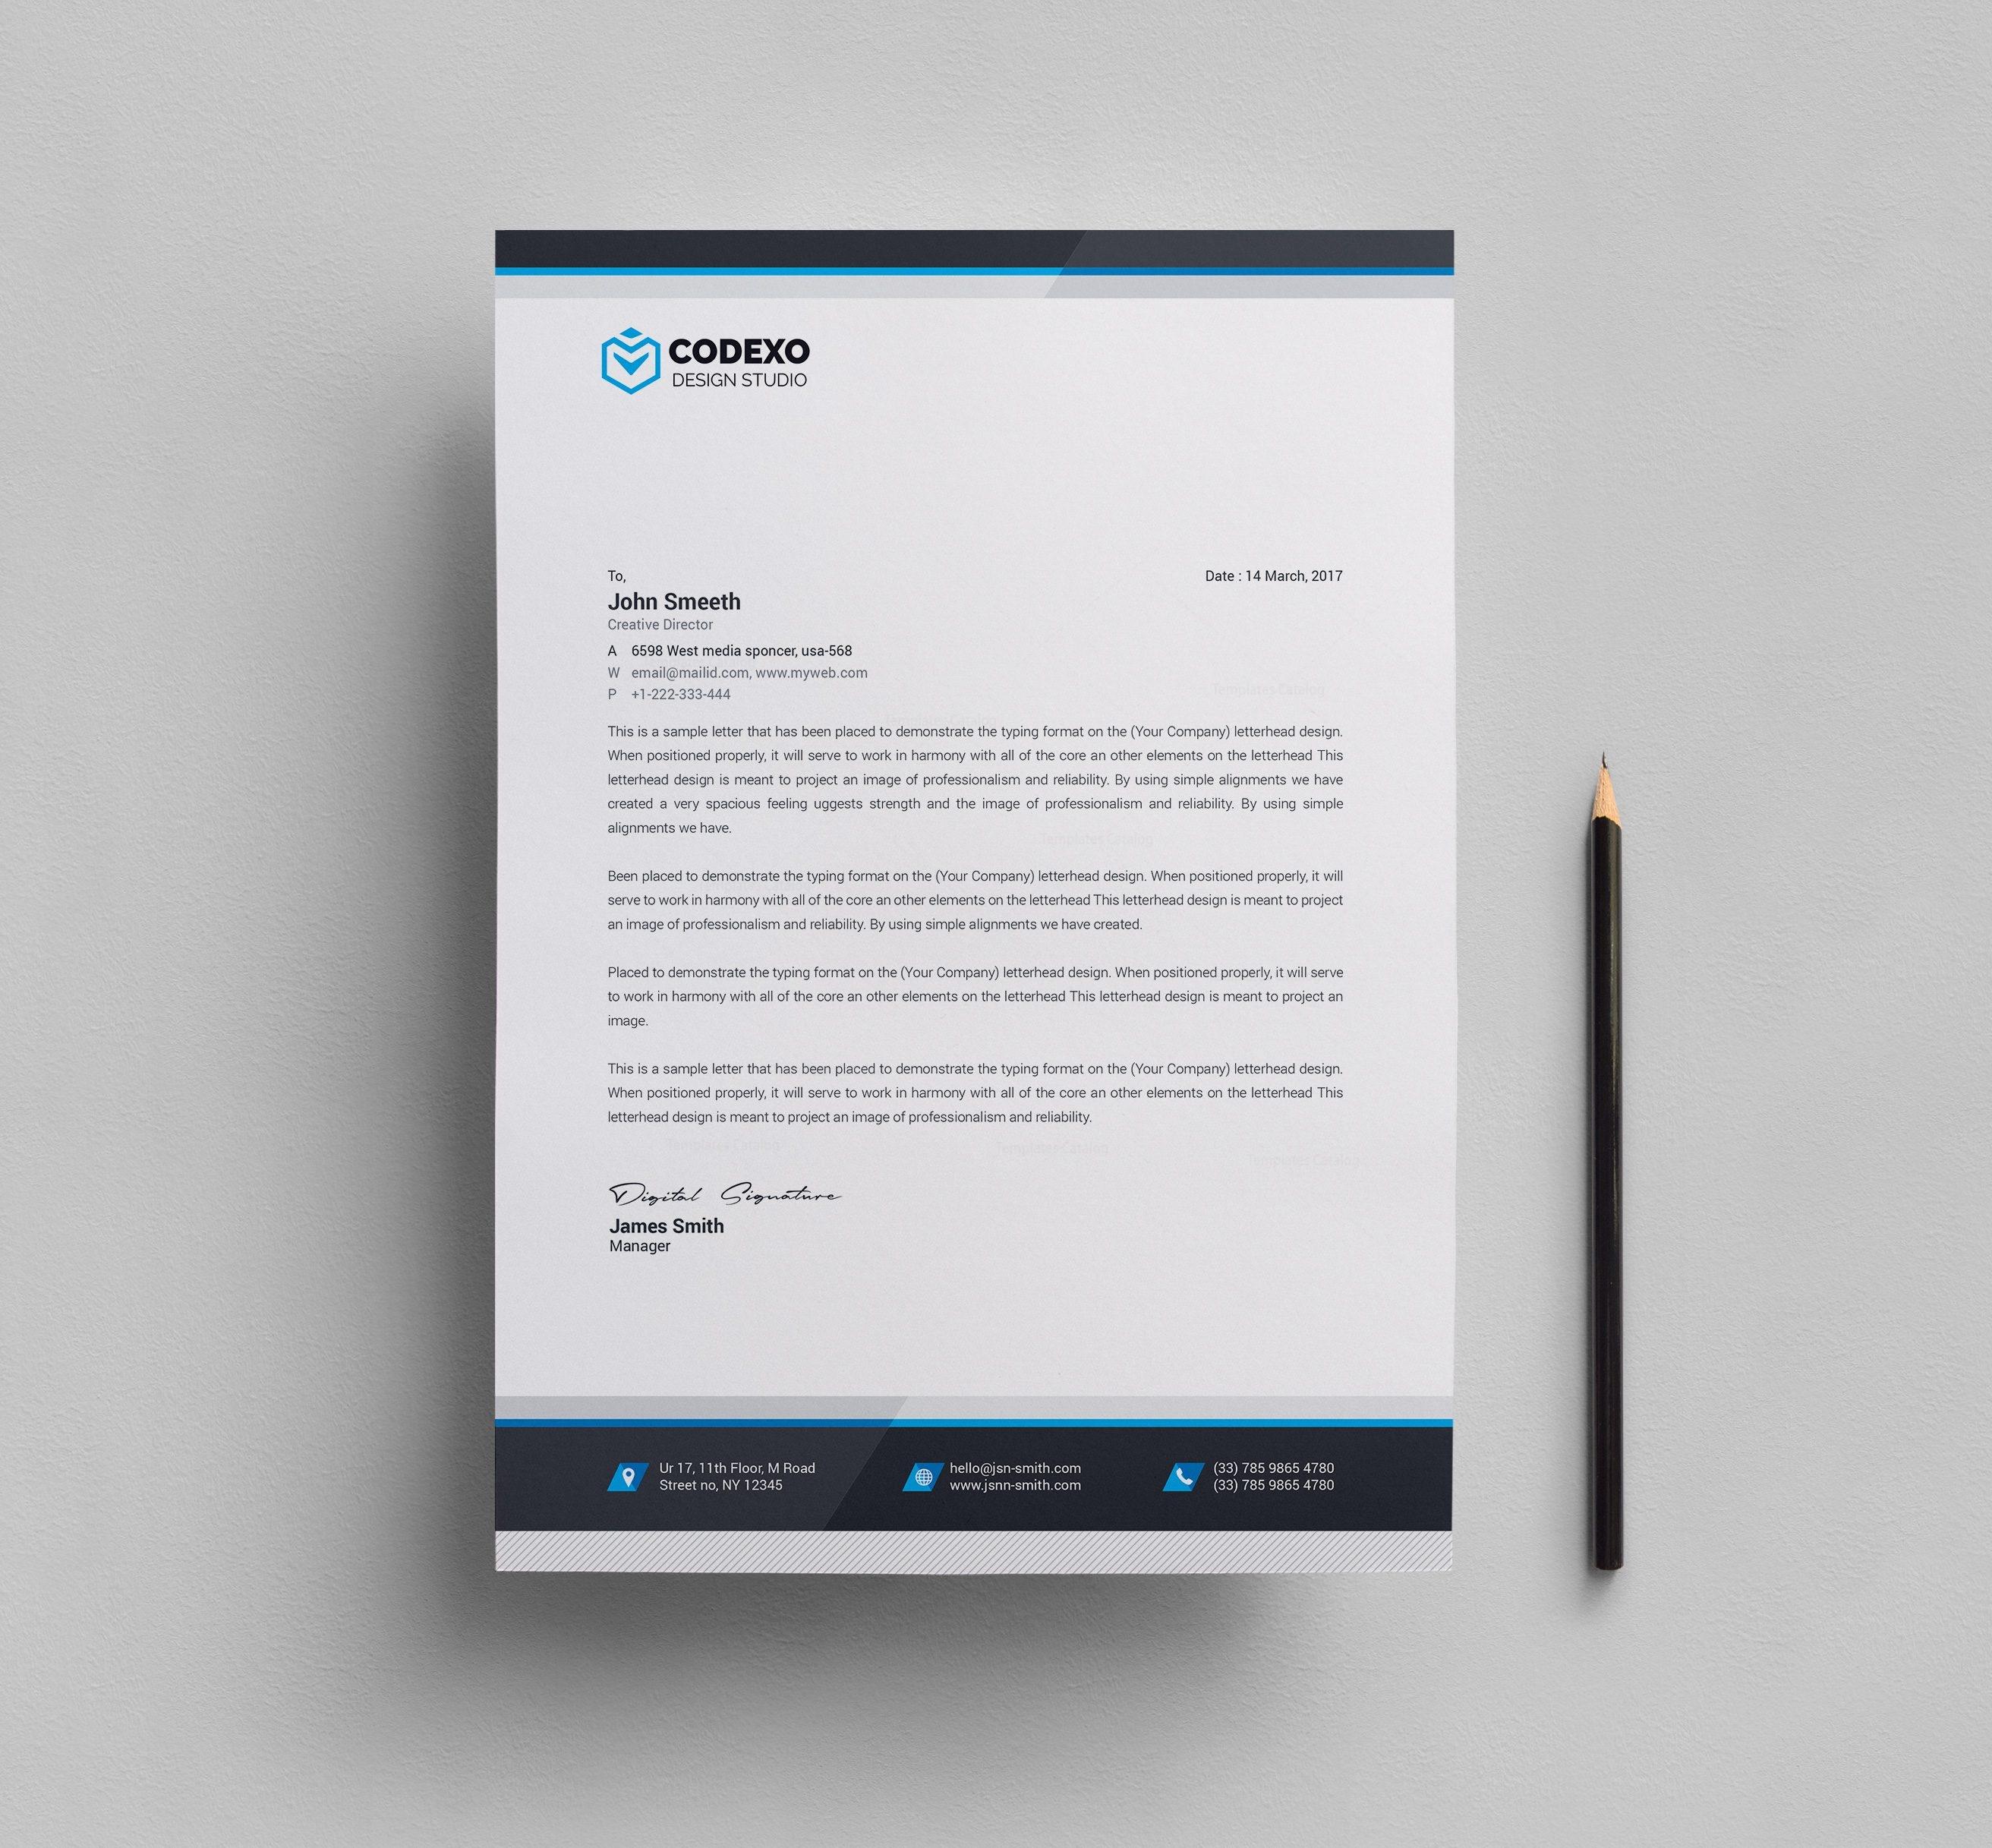 Professional Letterhead Design Ideas 15 Professional Business ...